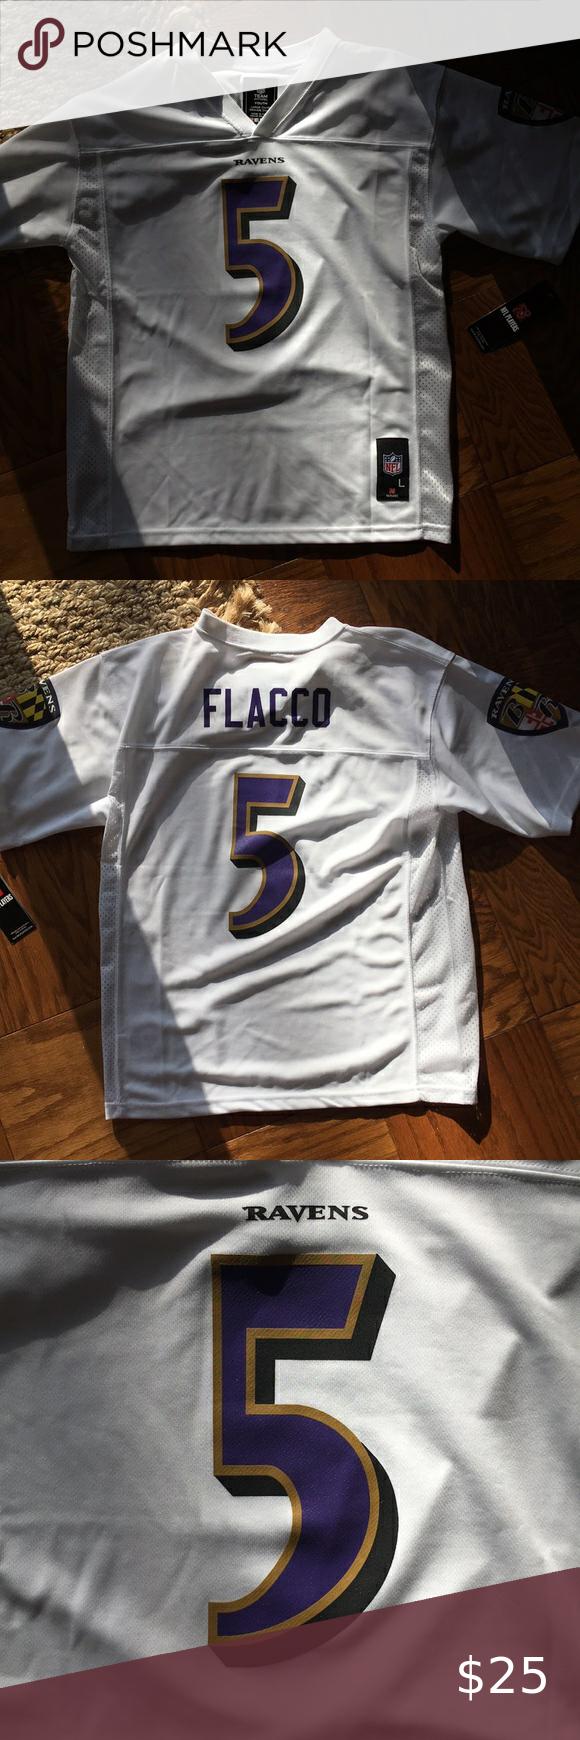 joe flacco youth jersey